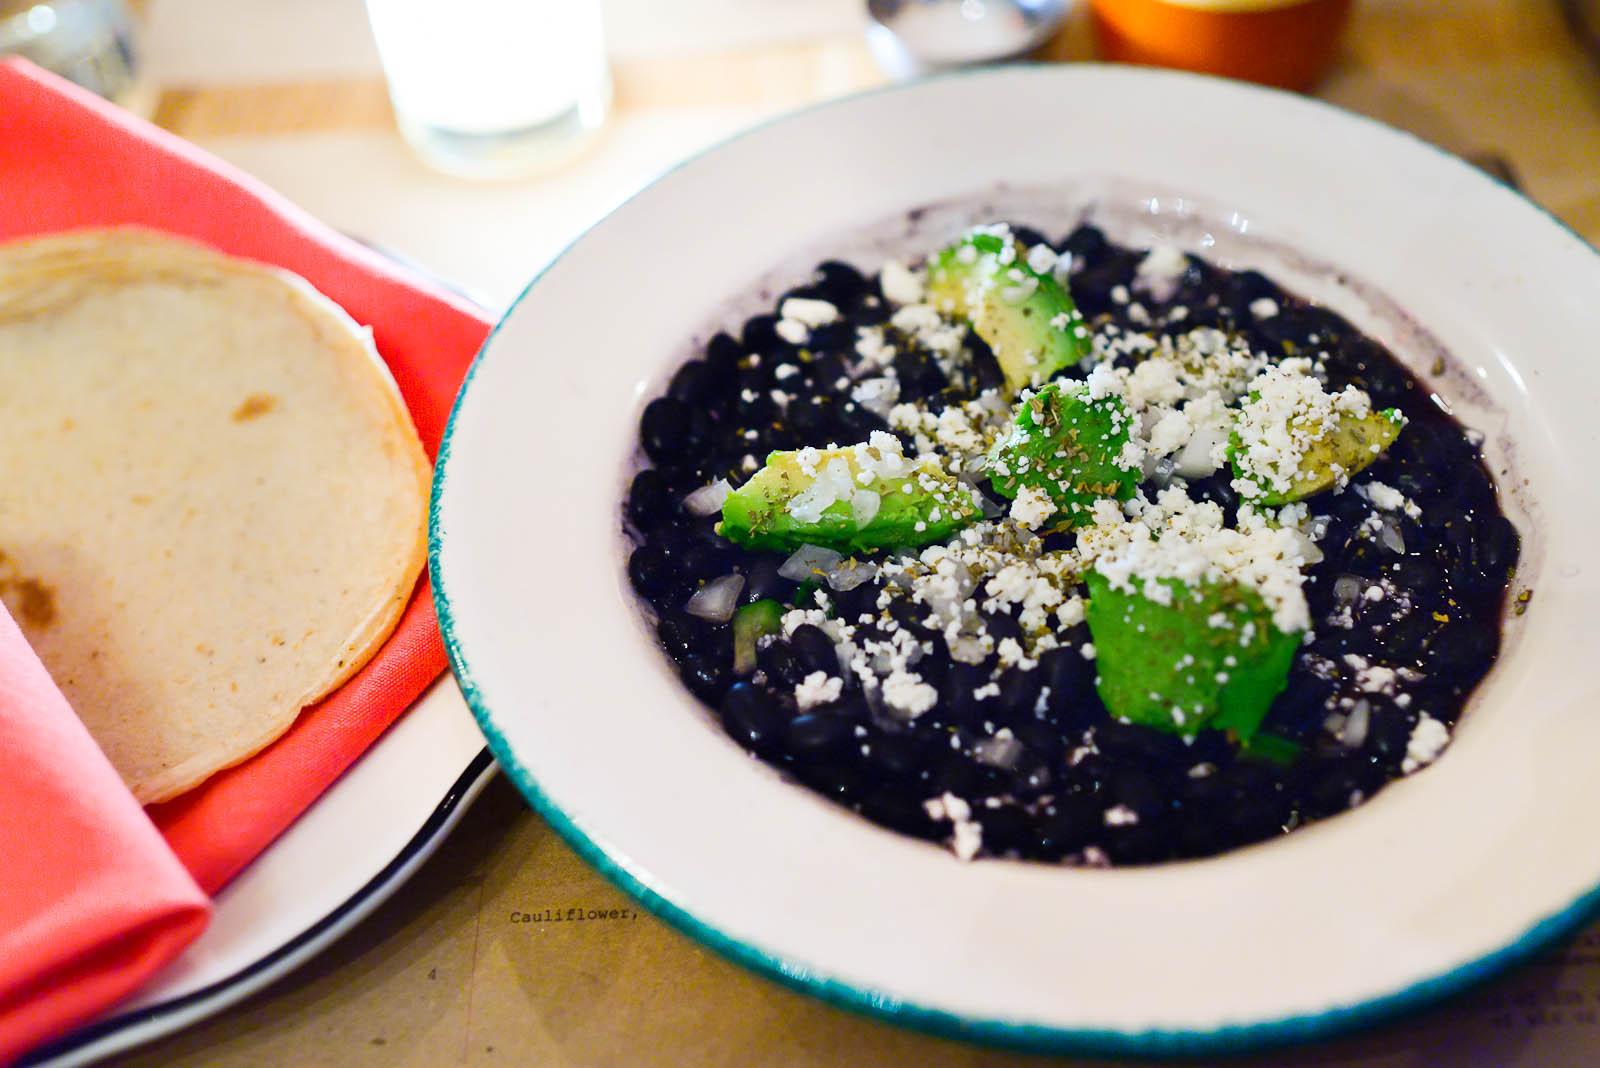 Frijoles de la olla - black beans, oregano, queso fresco ($9)